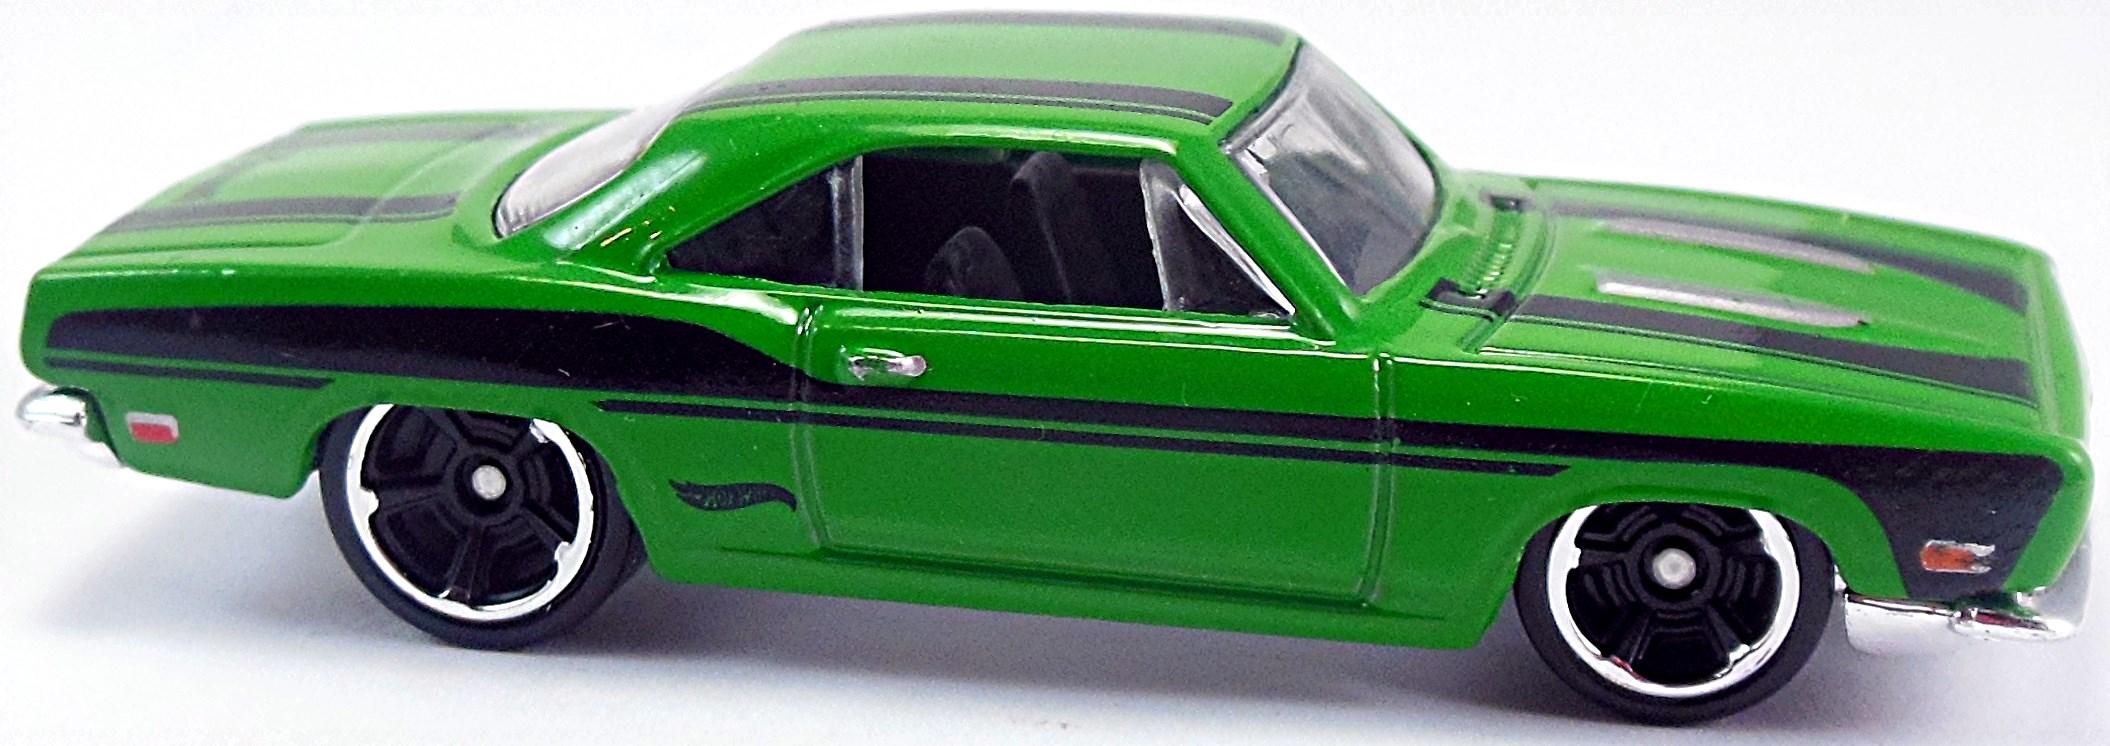 68 Plymouth Barracuda Formula S (f)   Hot Wheels Newsletter